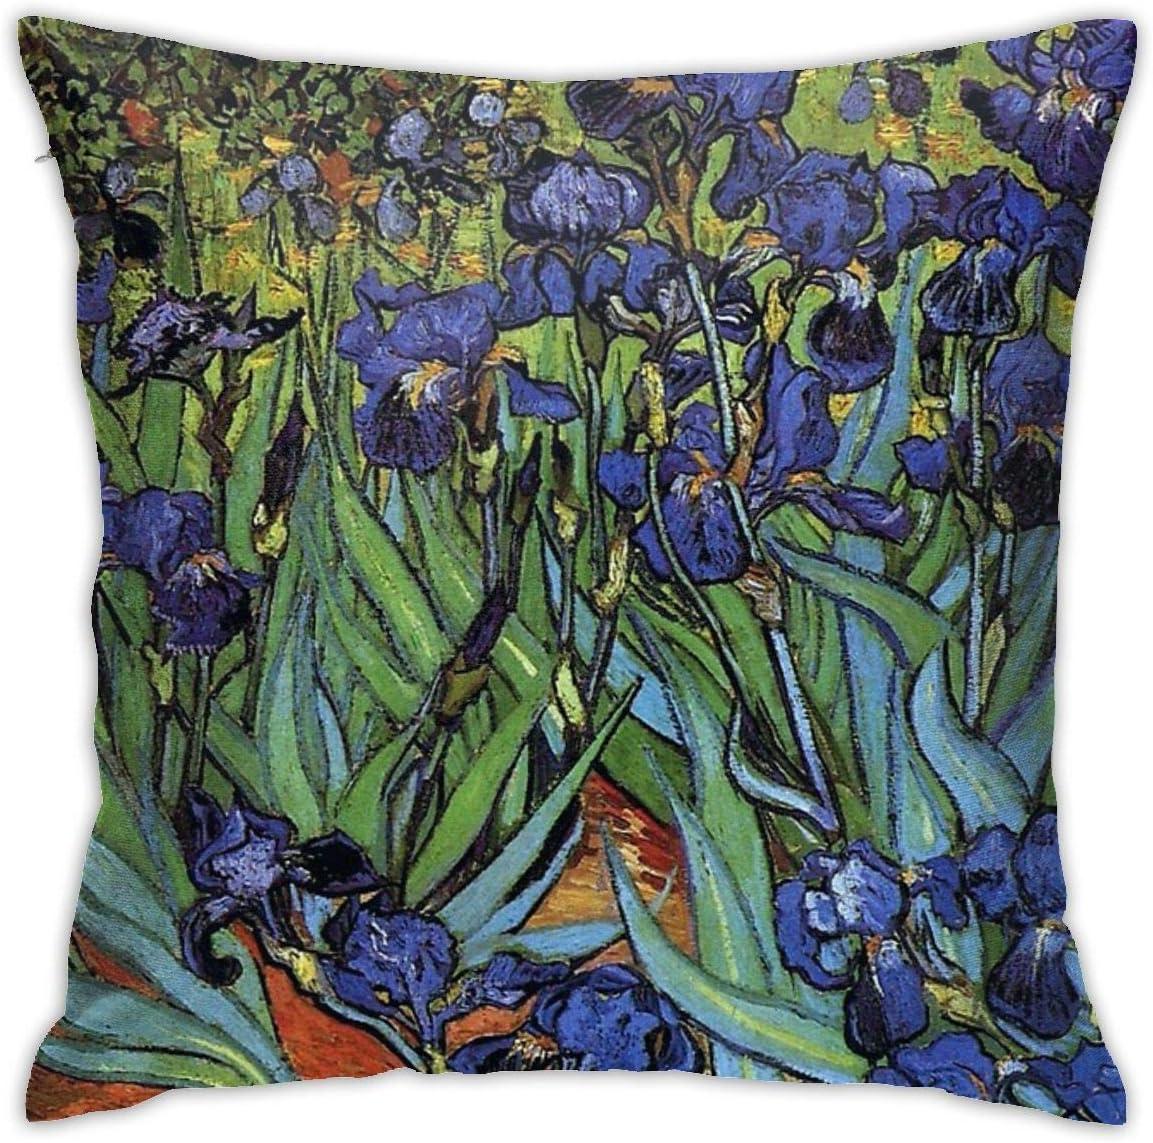 NYF Home Decor Van Gogh Irises Purple Fine Art Square Throw Pillow Cushion Covers Pillow Case, Soft Decorative Pillowcase for Sofa Chair